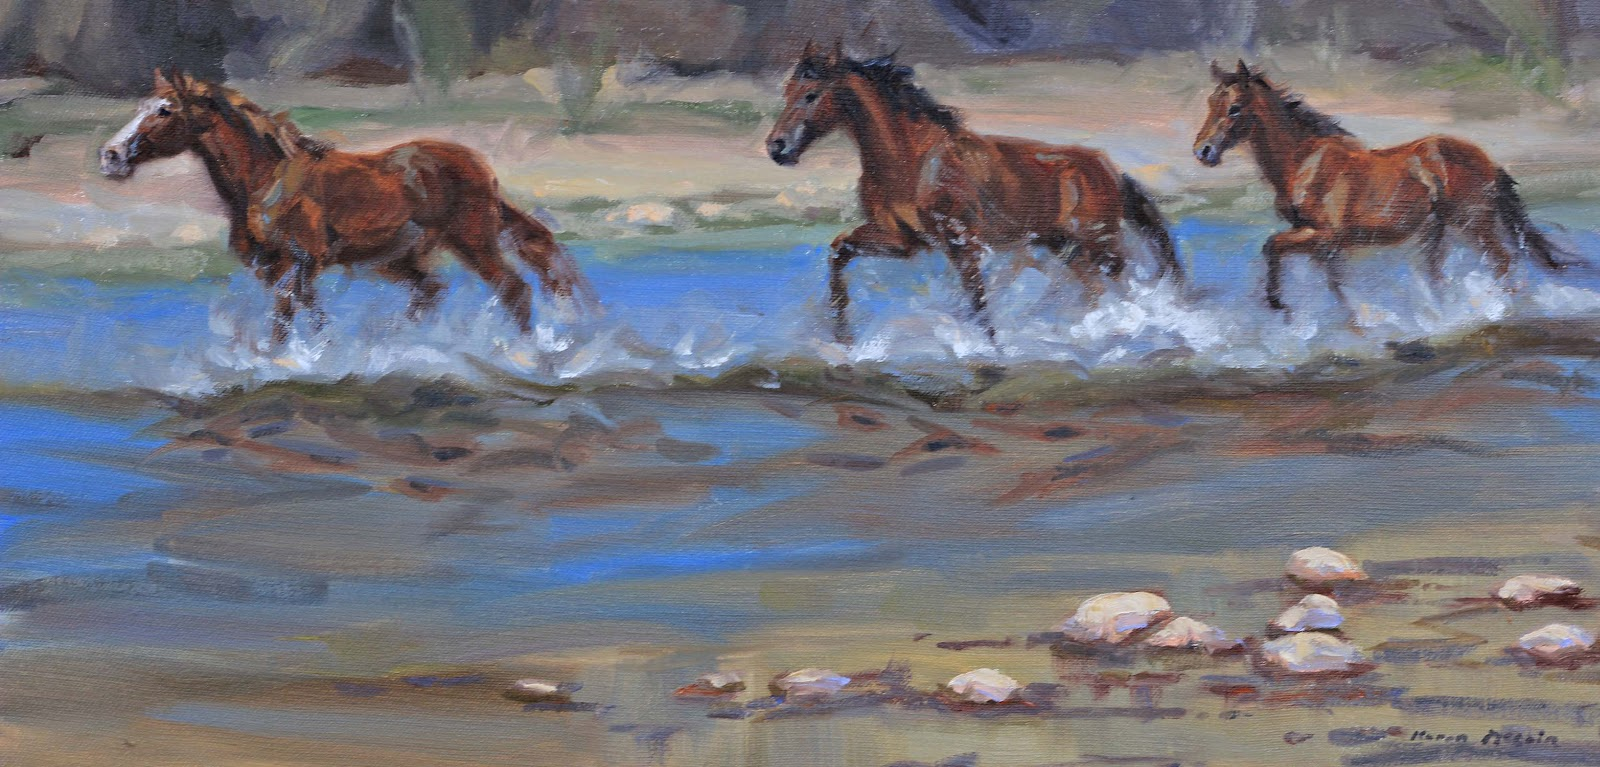 karen mclain studio wild horses running free